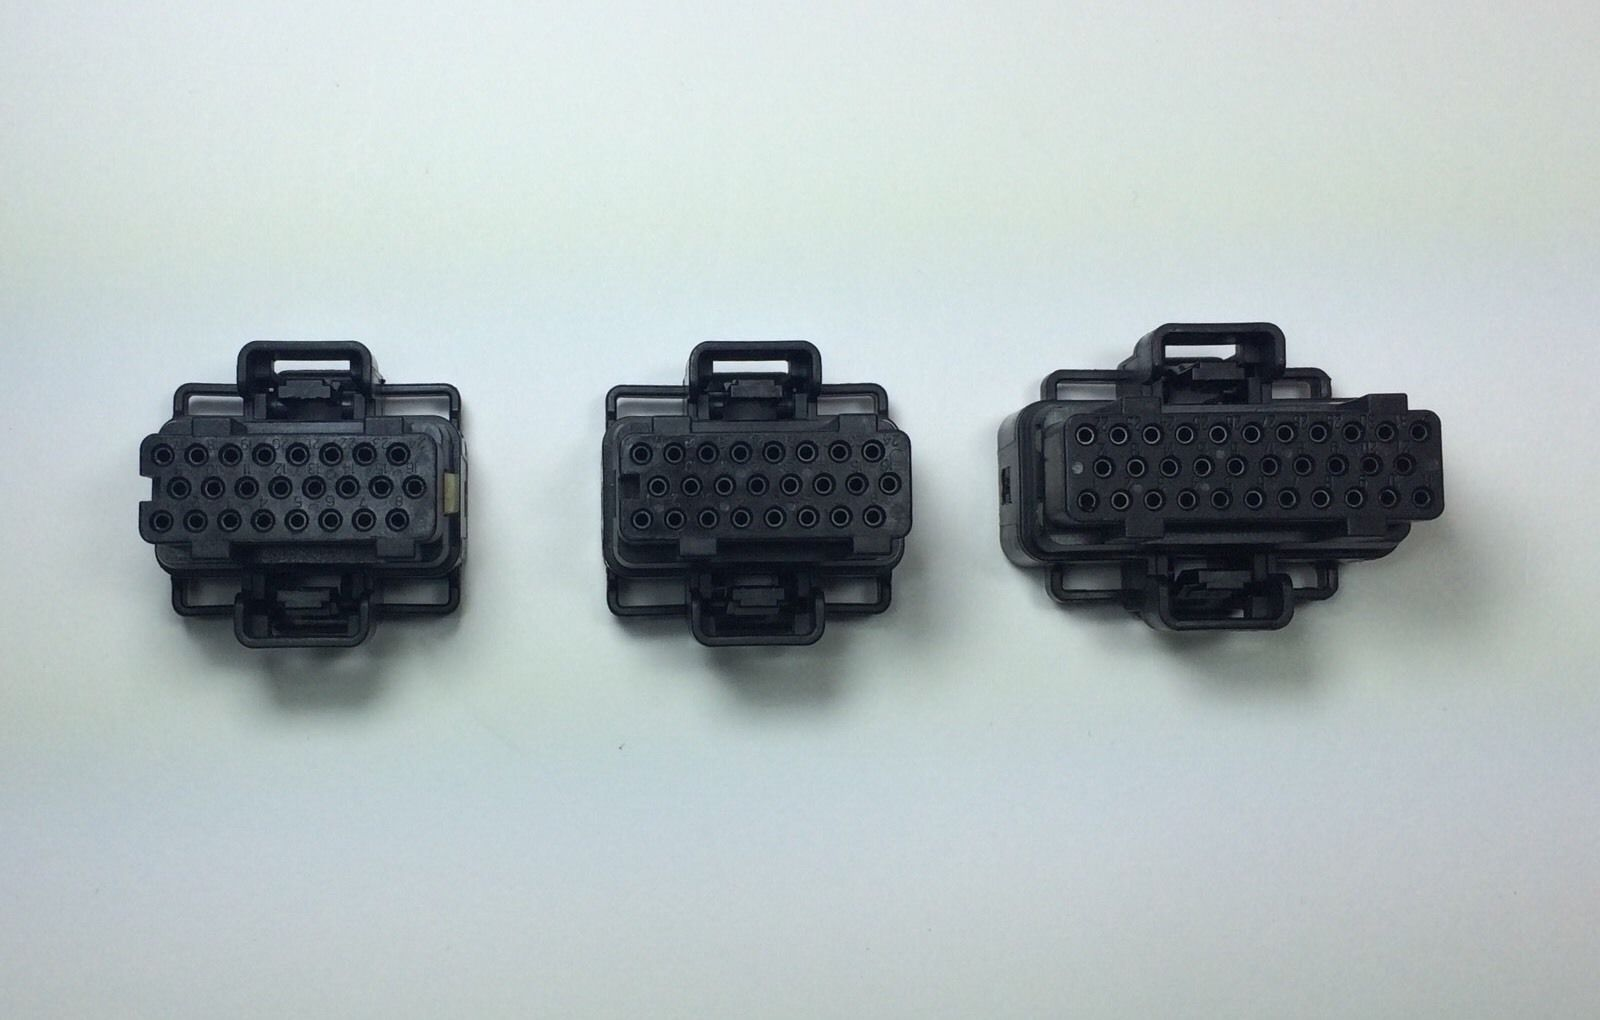 Land Rover Amr 6431 Wiring Diagram - Wiring Diagrams Schematics